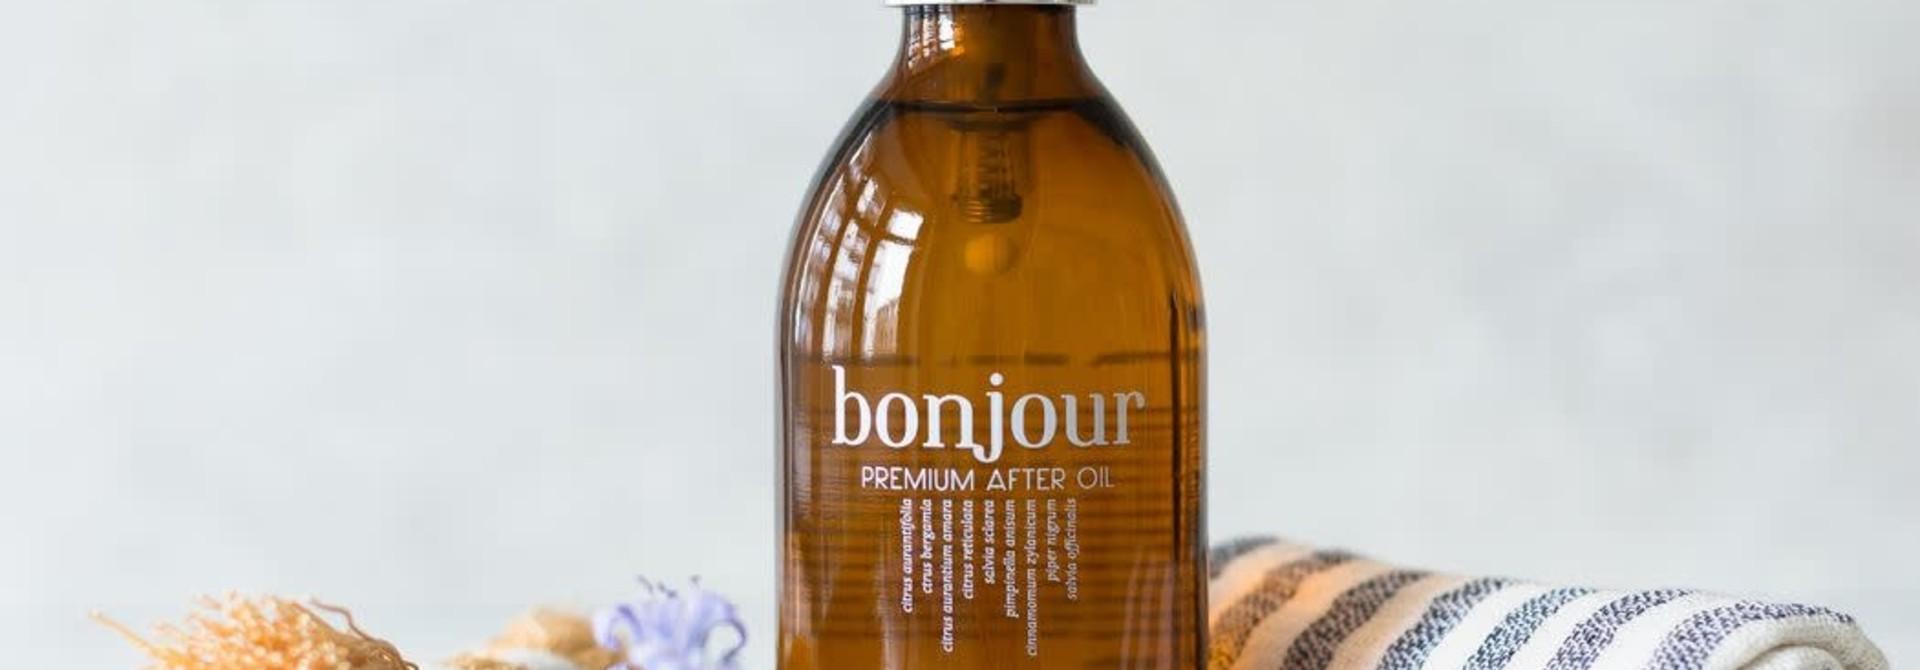 Bonjour Premium After Oil